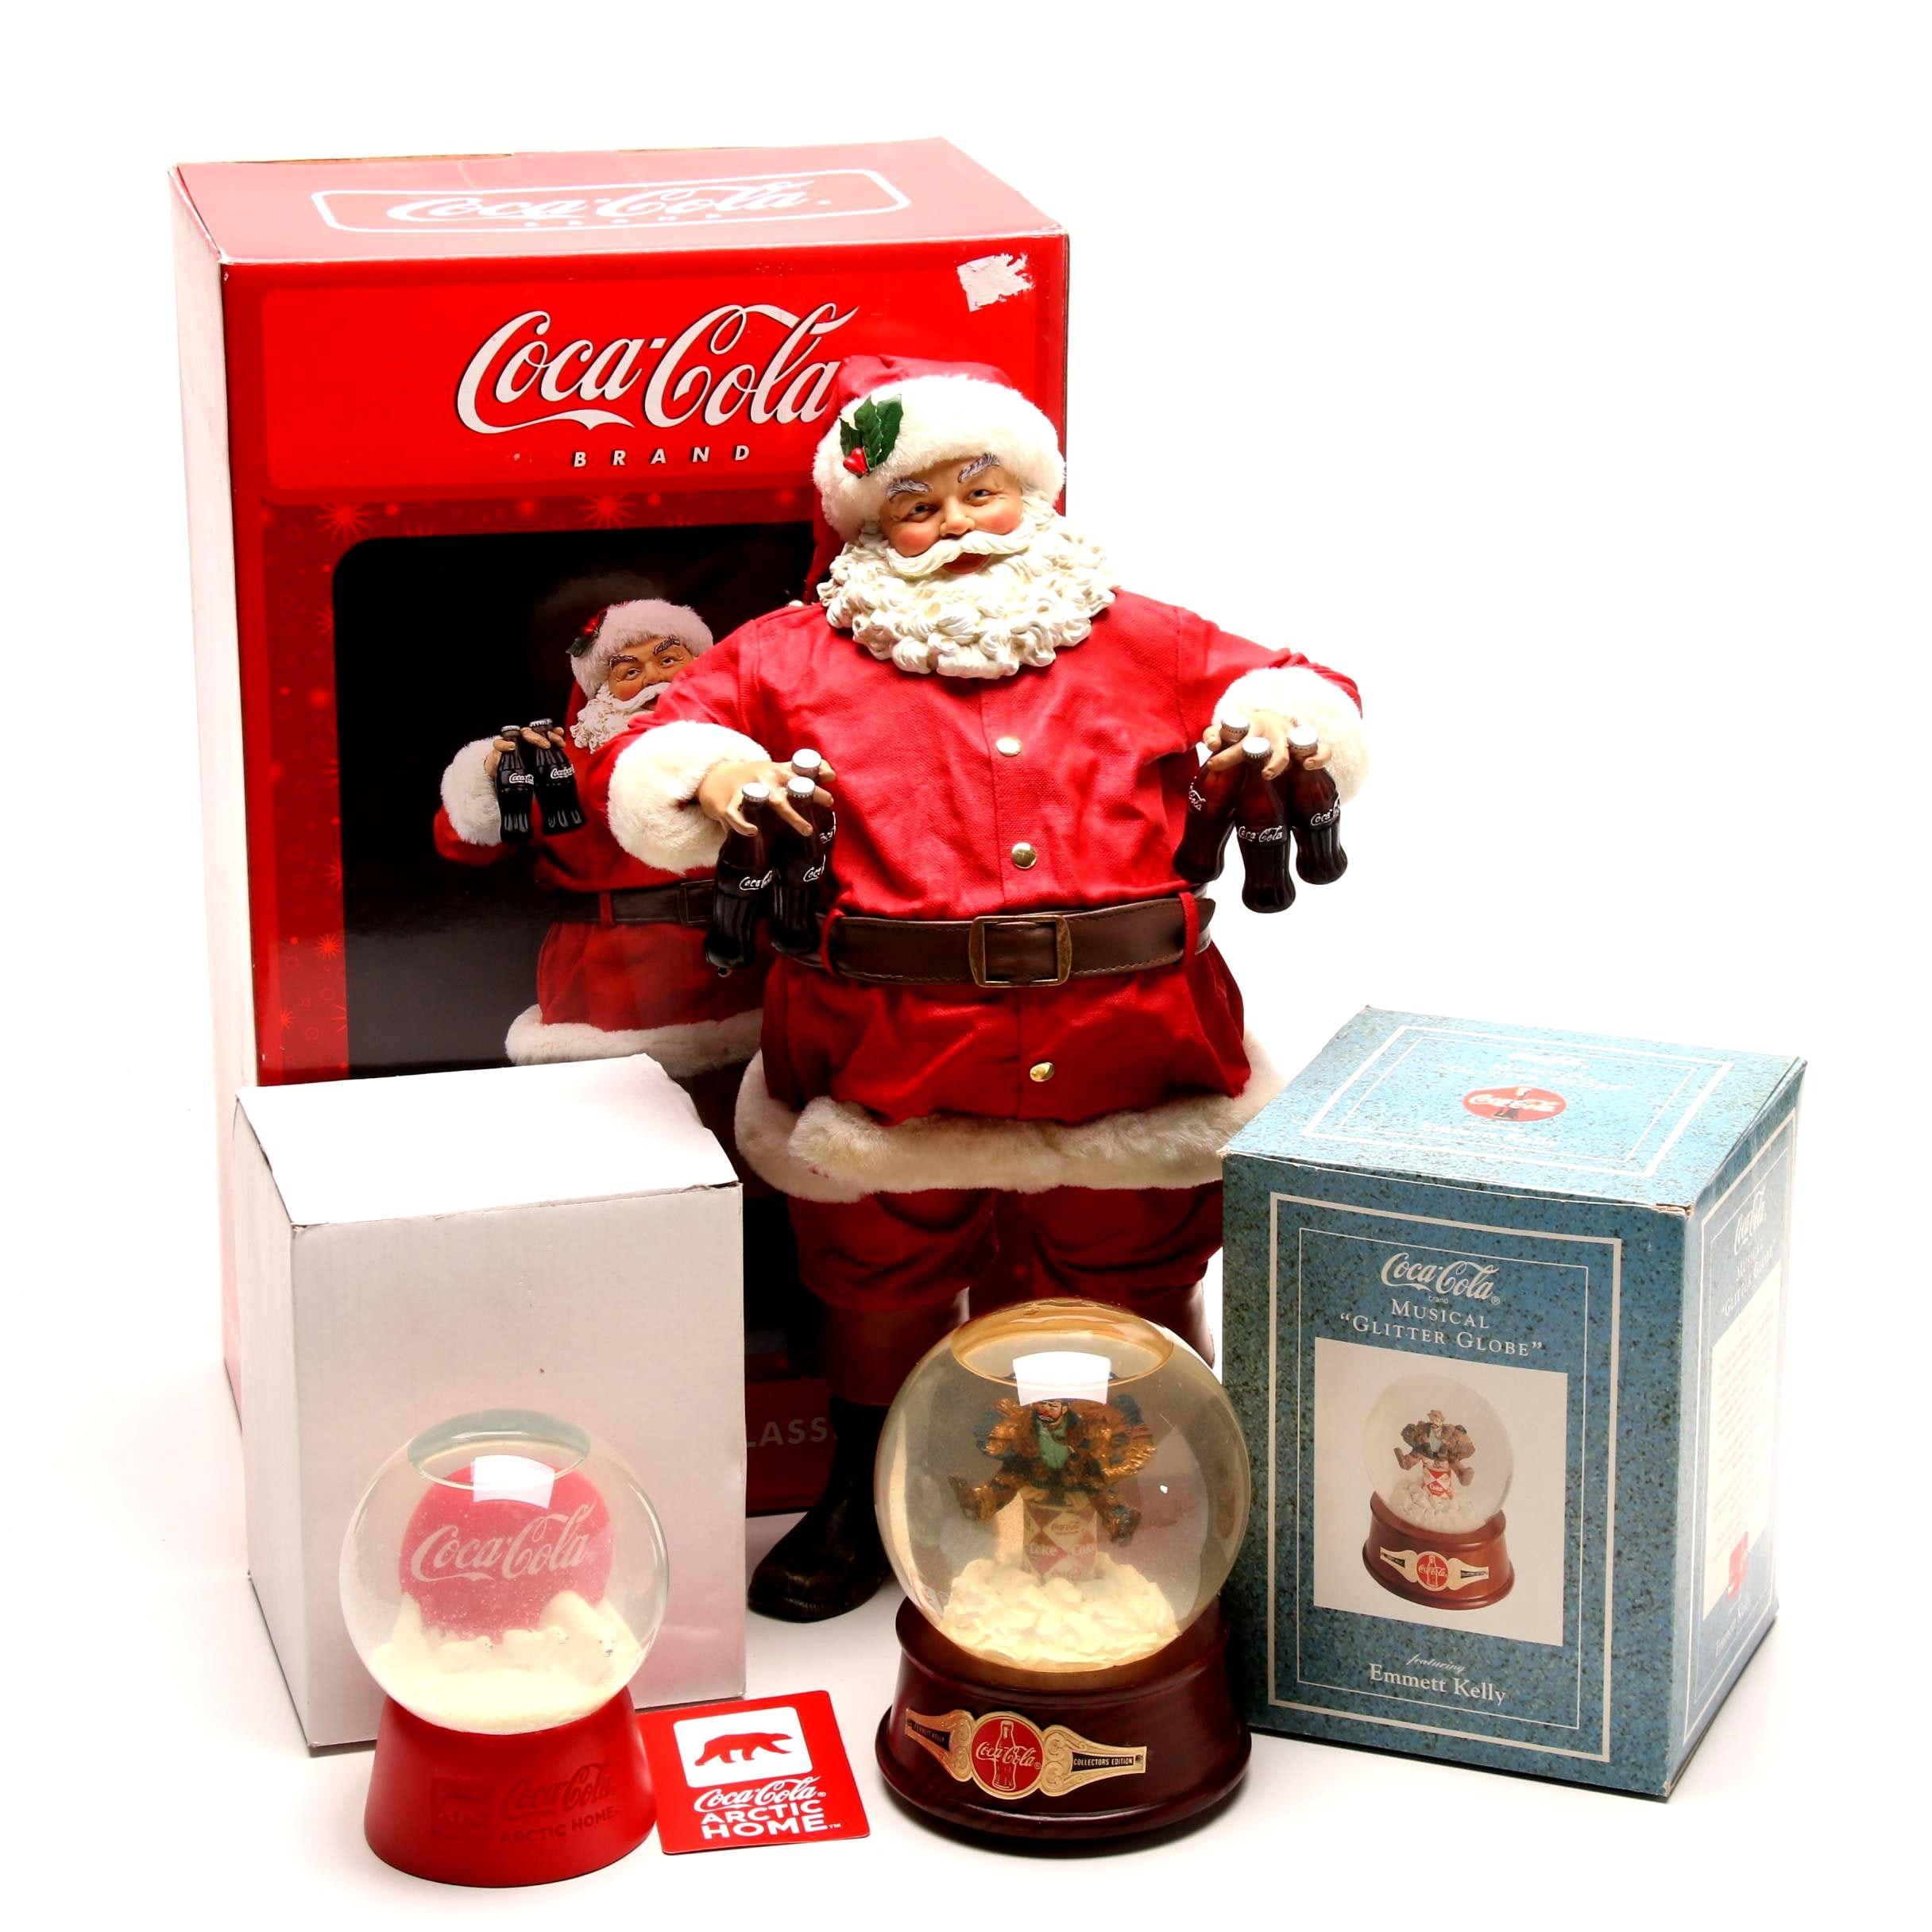 Coca-Cola Snow Globes and Santa Figurine